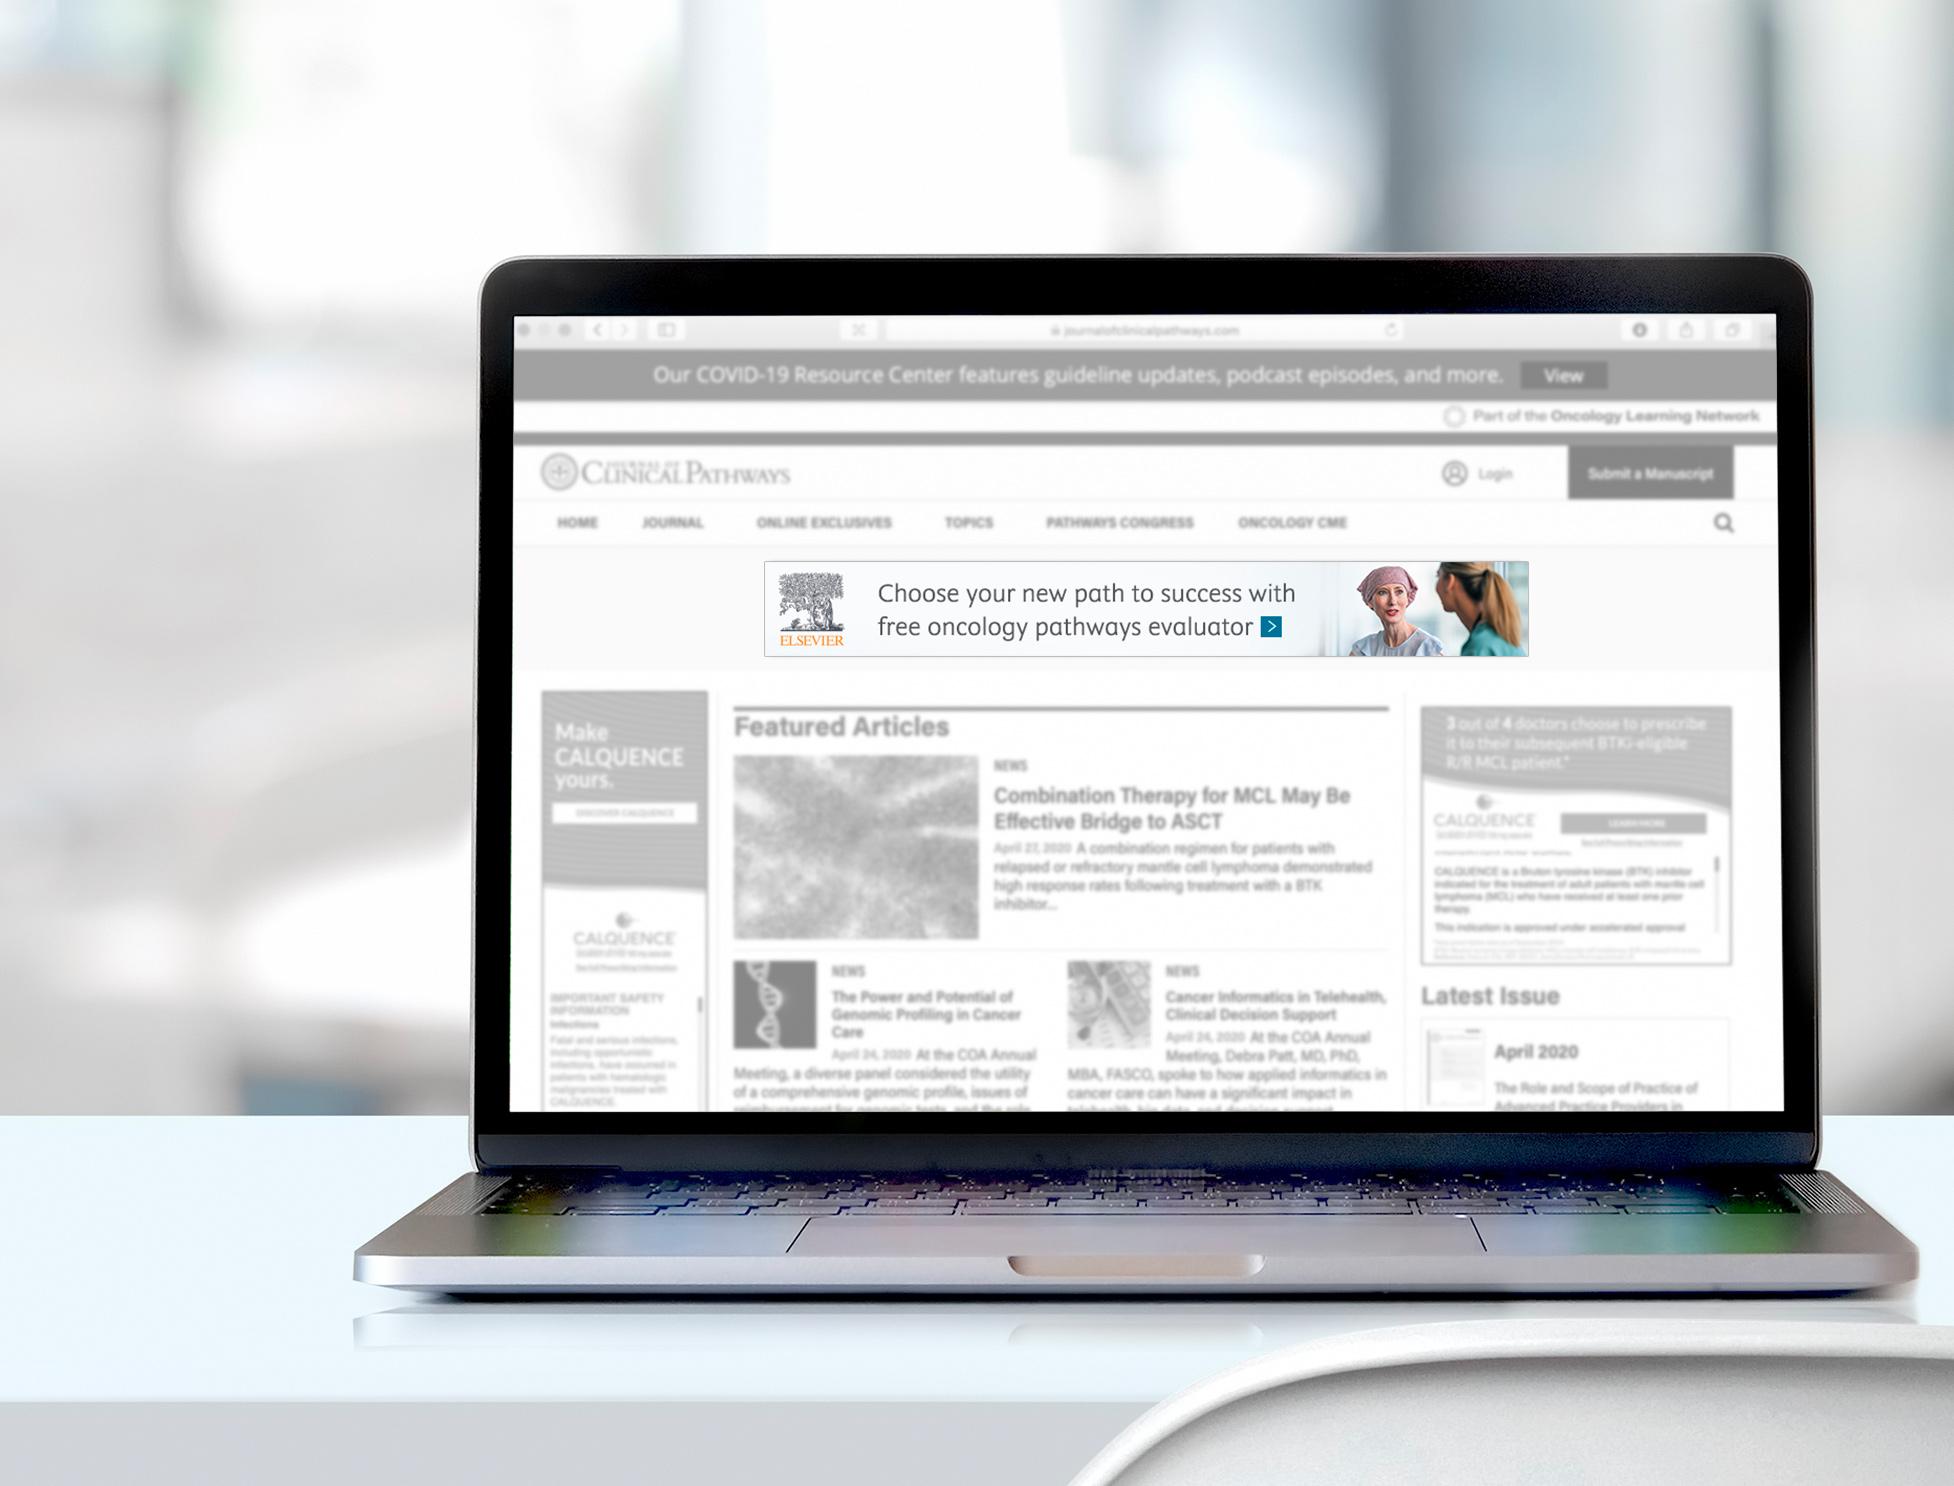 Work_Elsevier_ClinicalPath_webadscreen